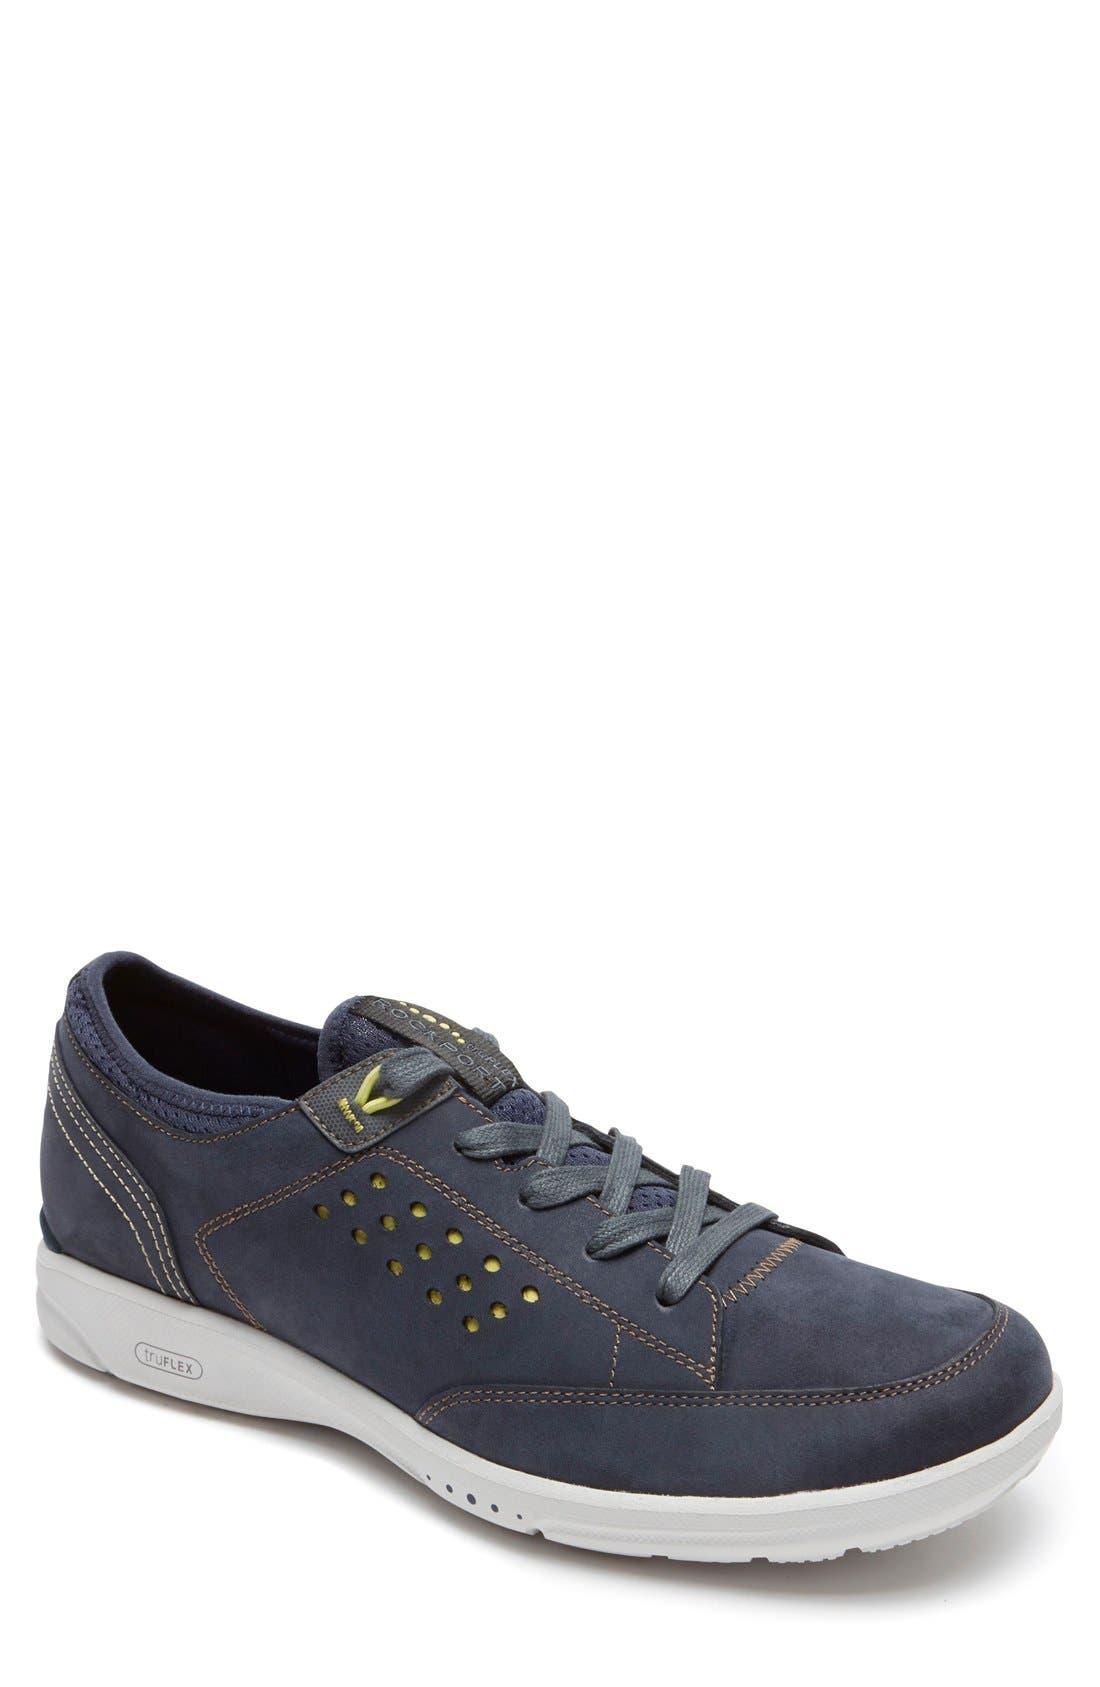 Truflex Sneaker,                         Main,                         color, New Dress Blues Nubuck